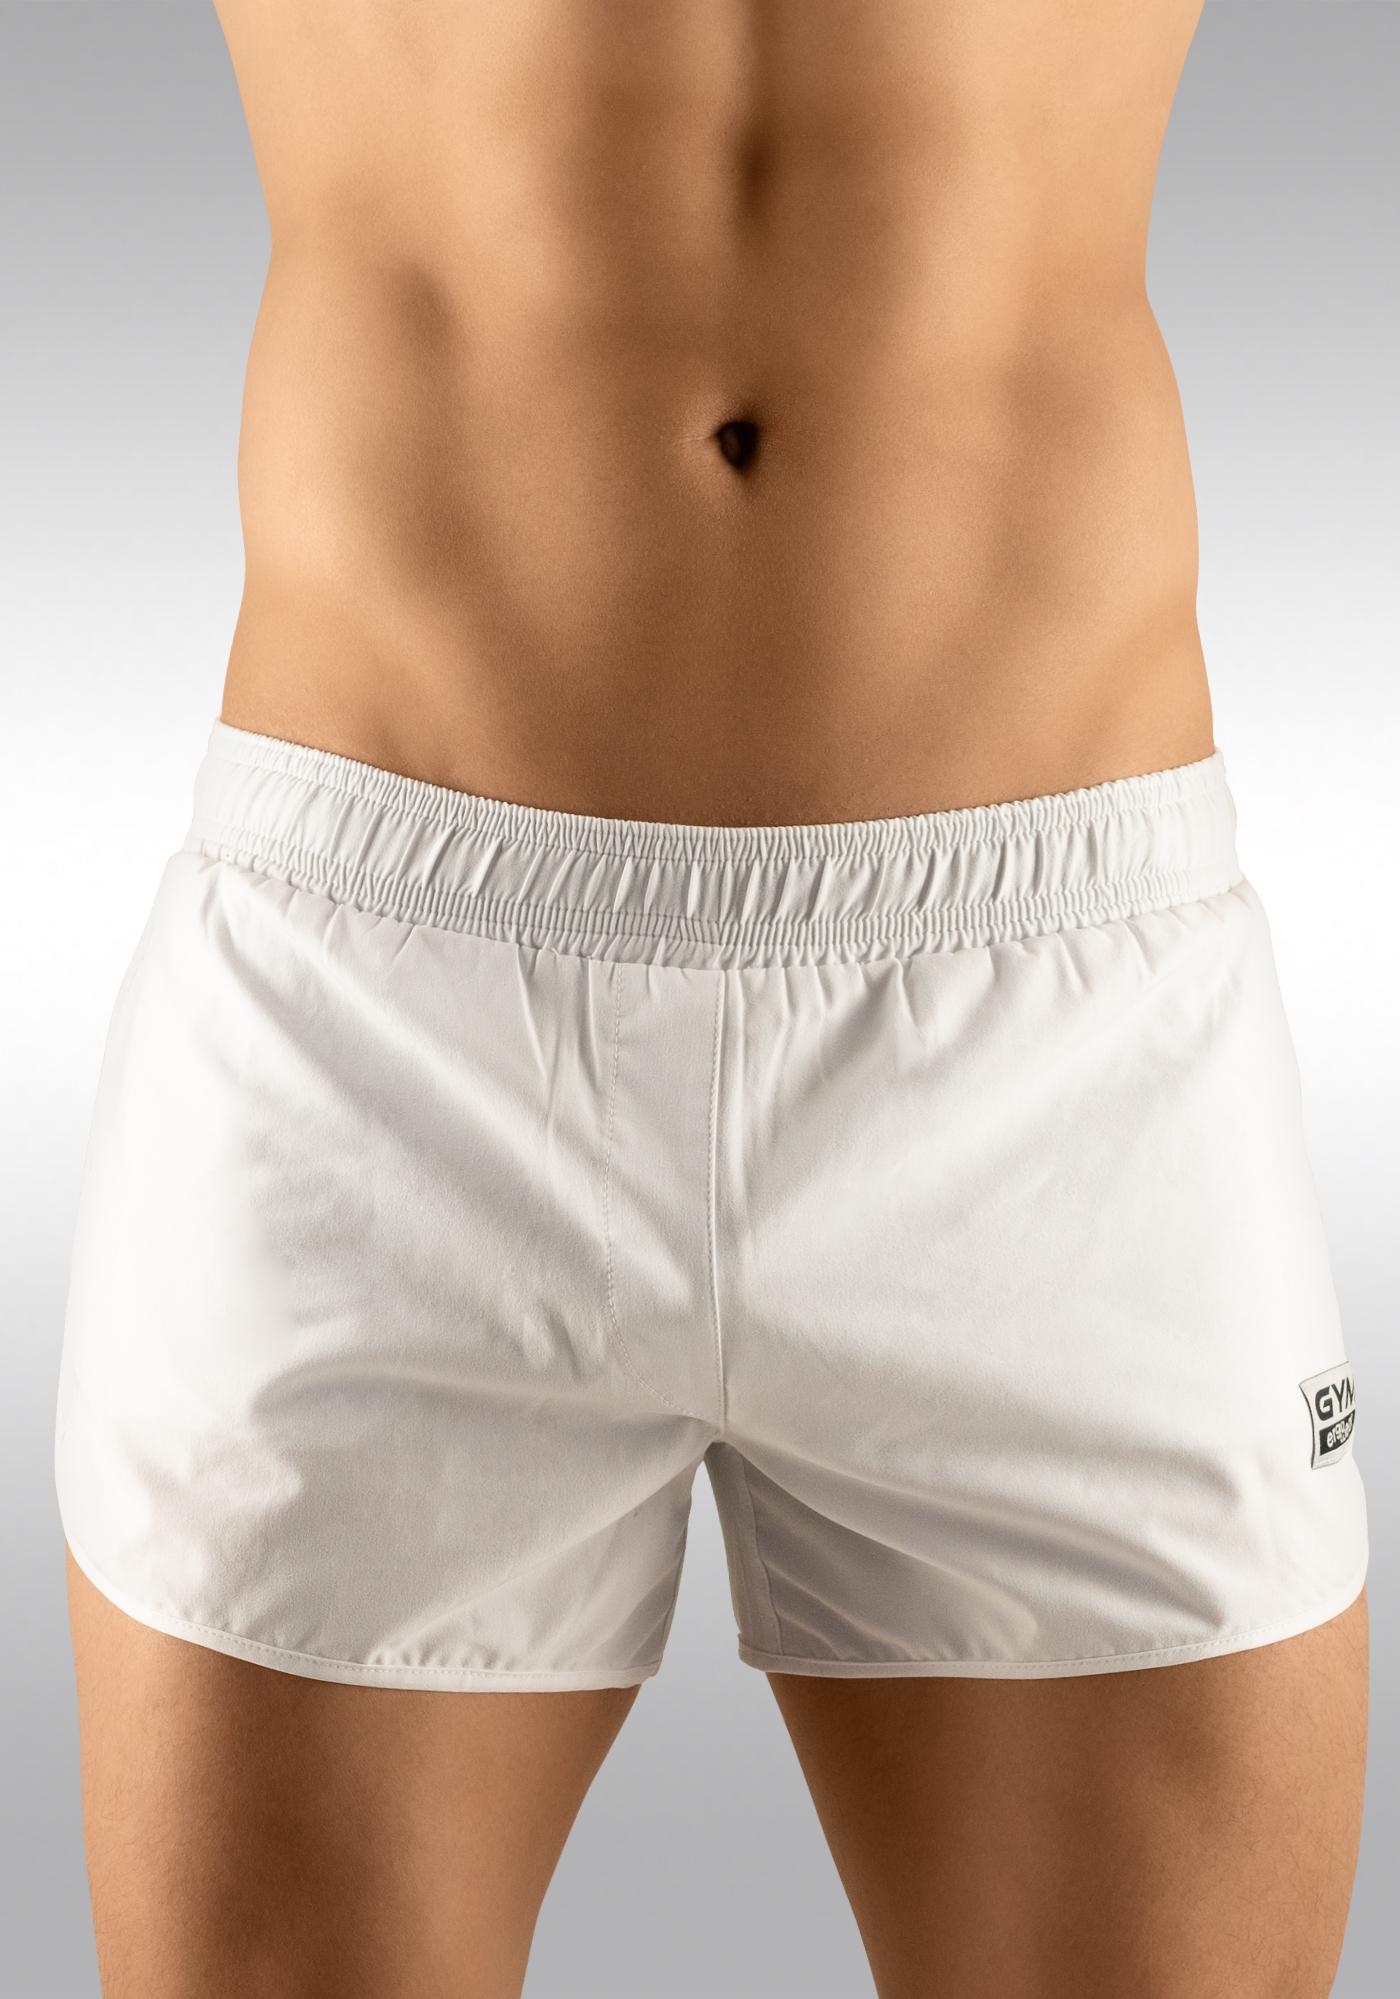 Men's Gym Shorts White - Ergowear